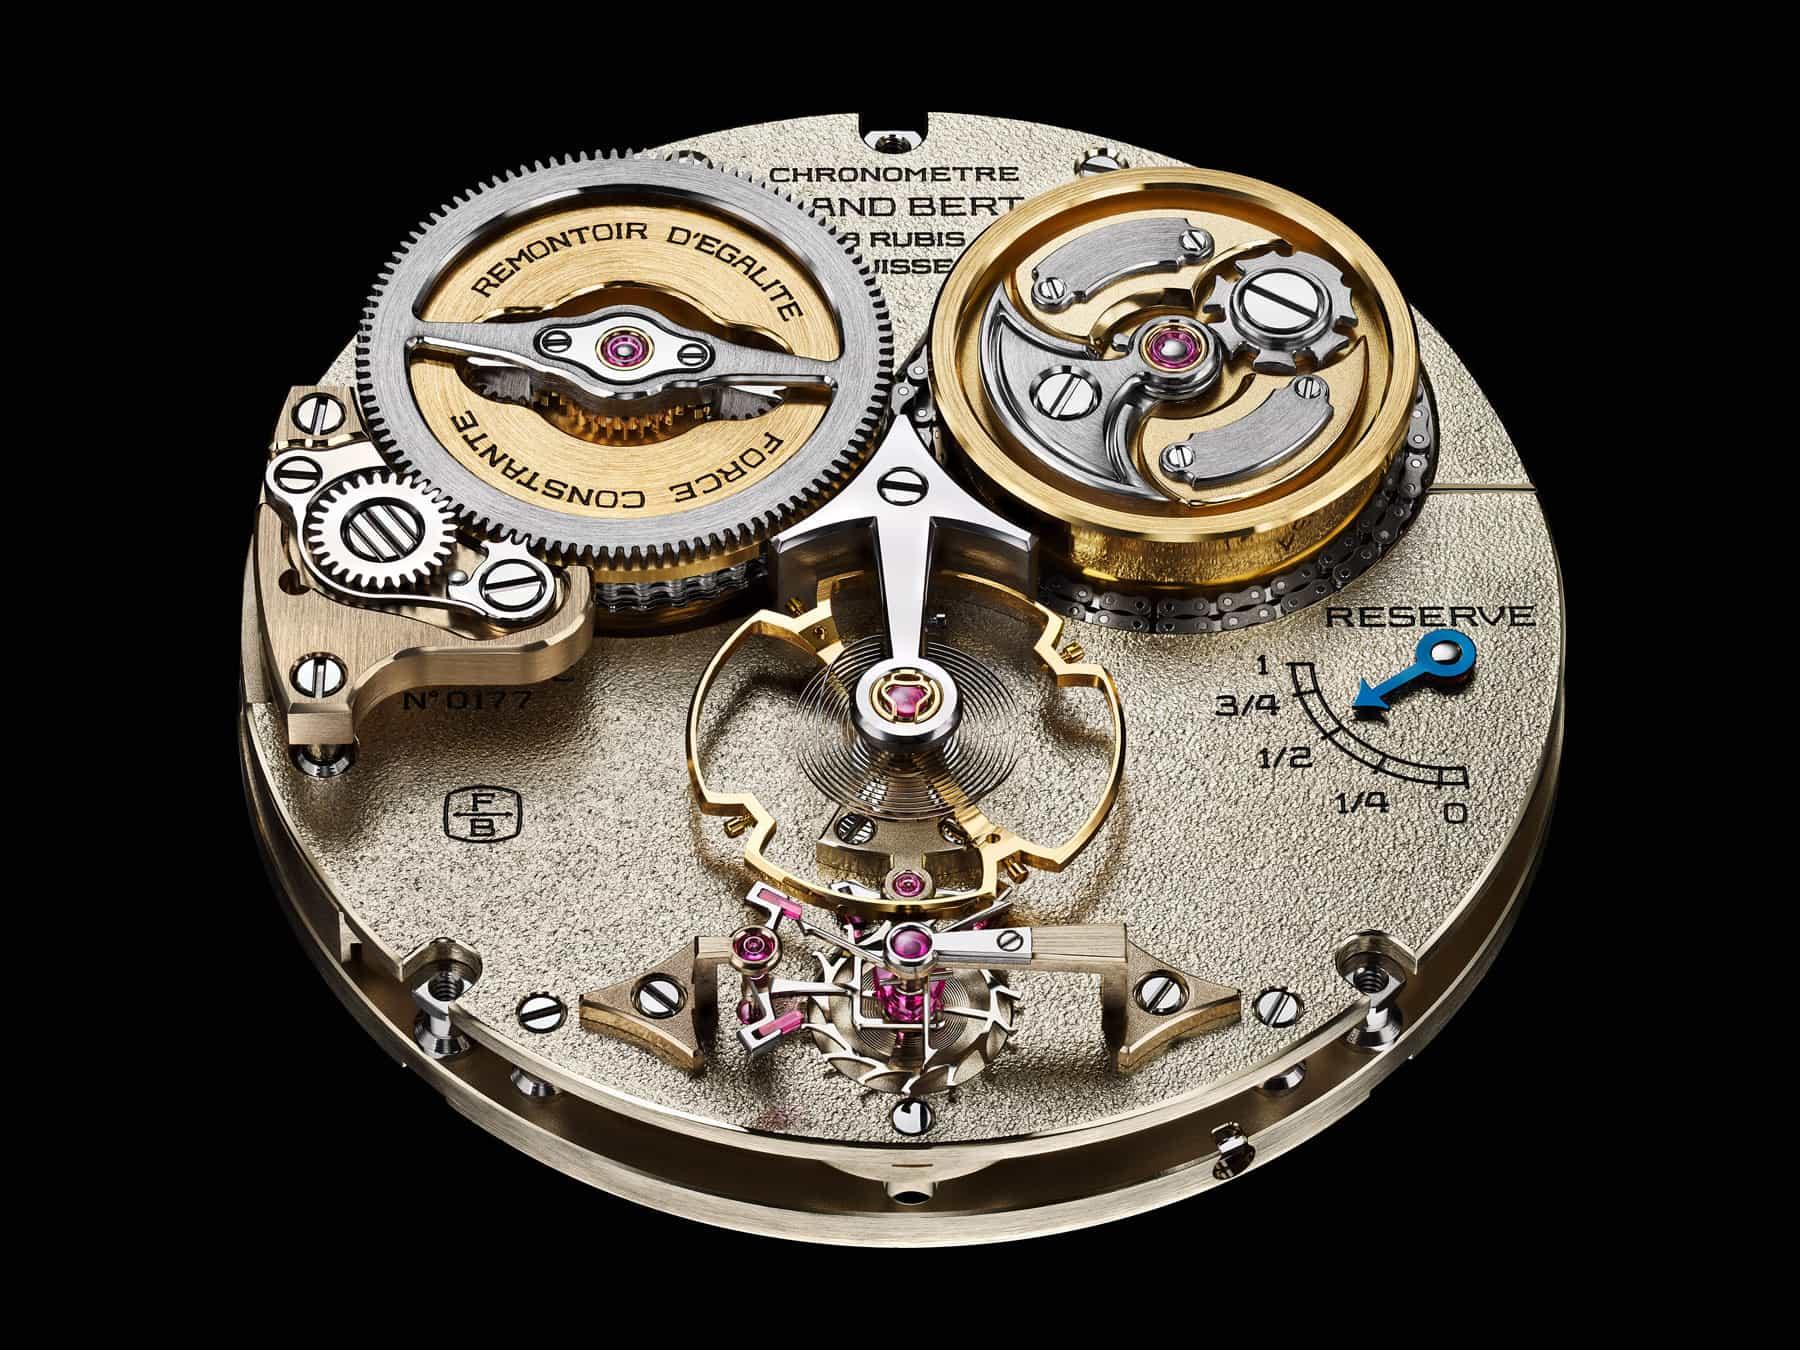 Das Chronometrie Kaliber Berthoud FB-RE.FC